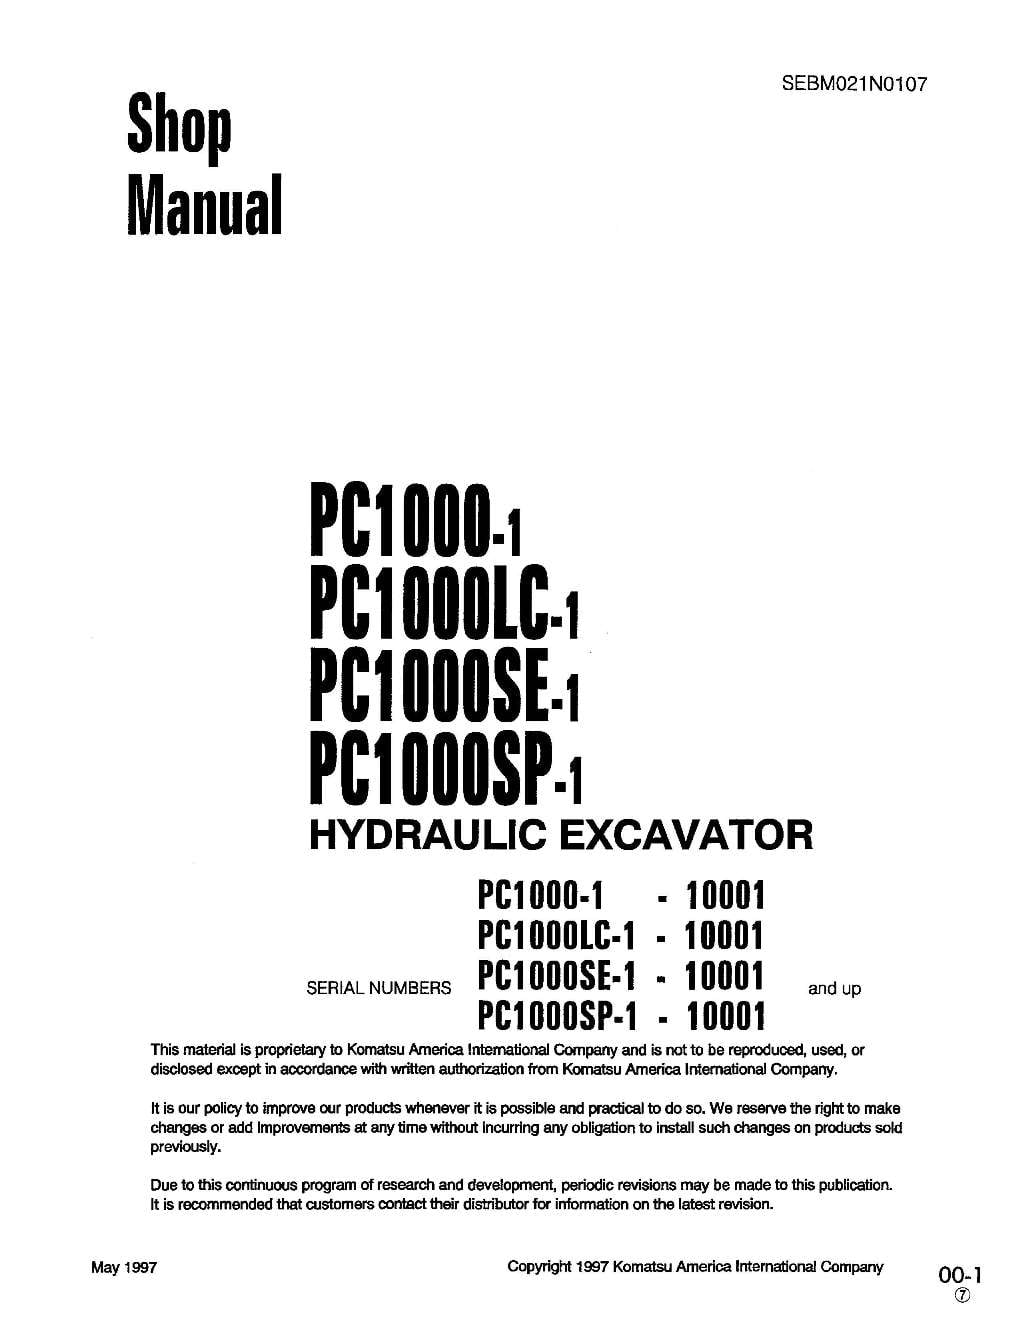 Komatsu PC1000-1/PC1000LC-1/PC1000SP-1/PC1000SE-1